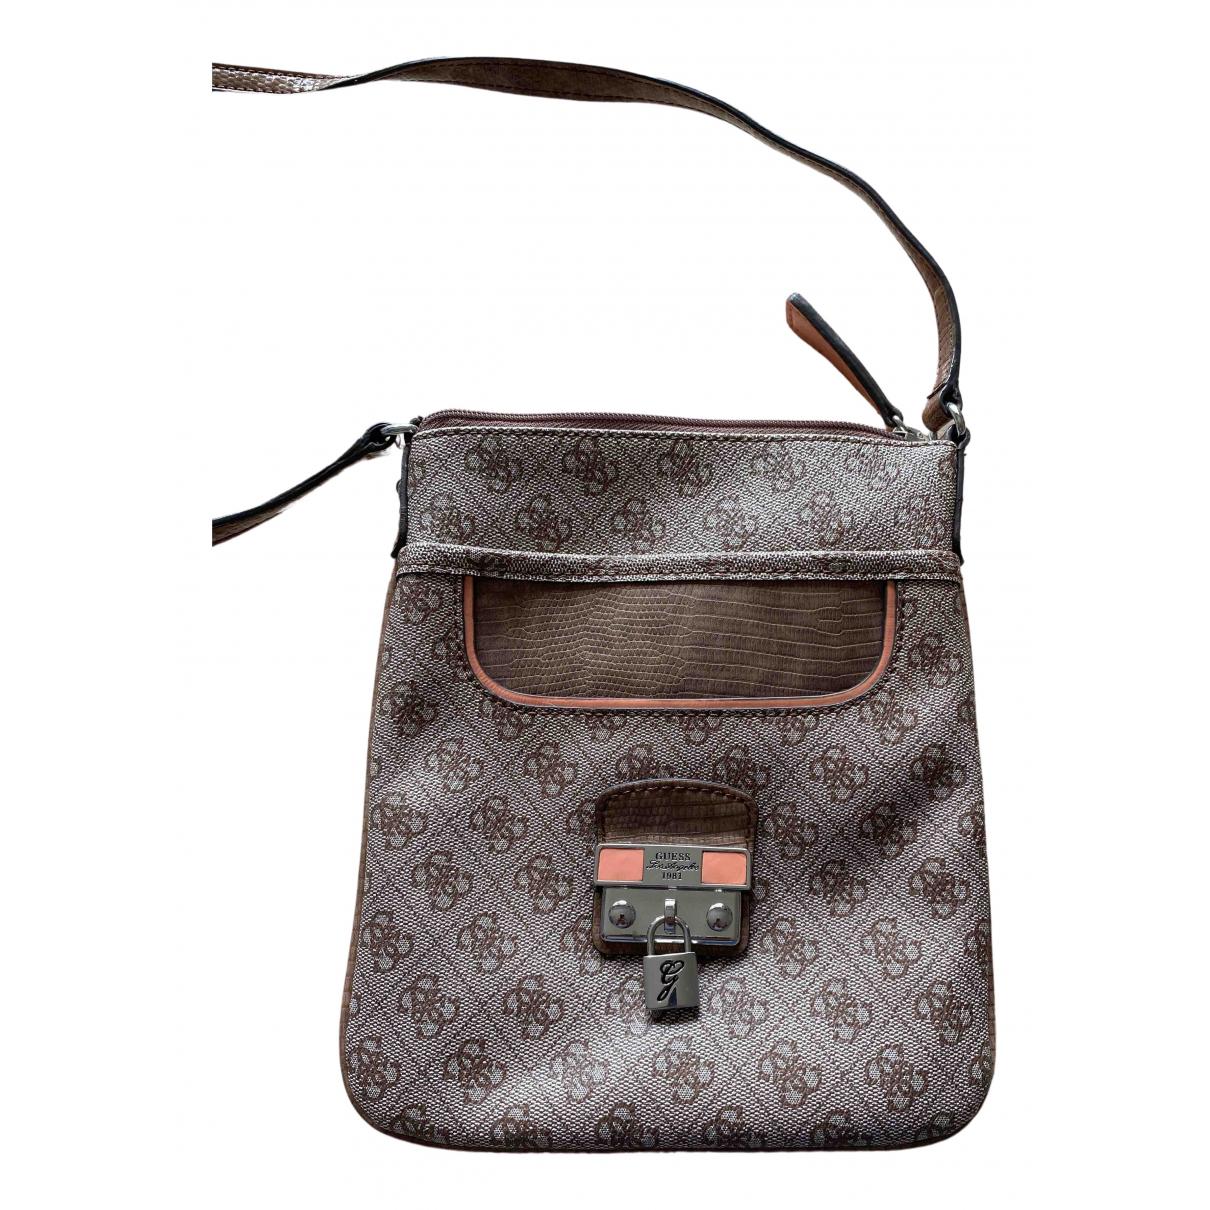 Guess N Camel Clutch bag for Women N